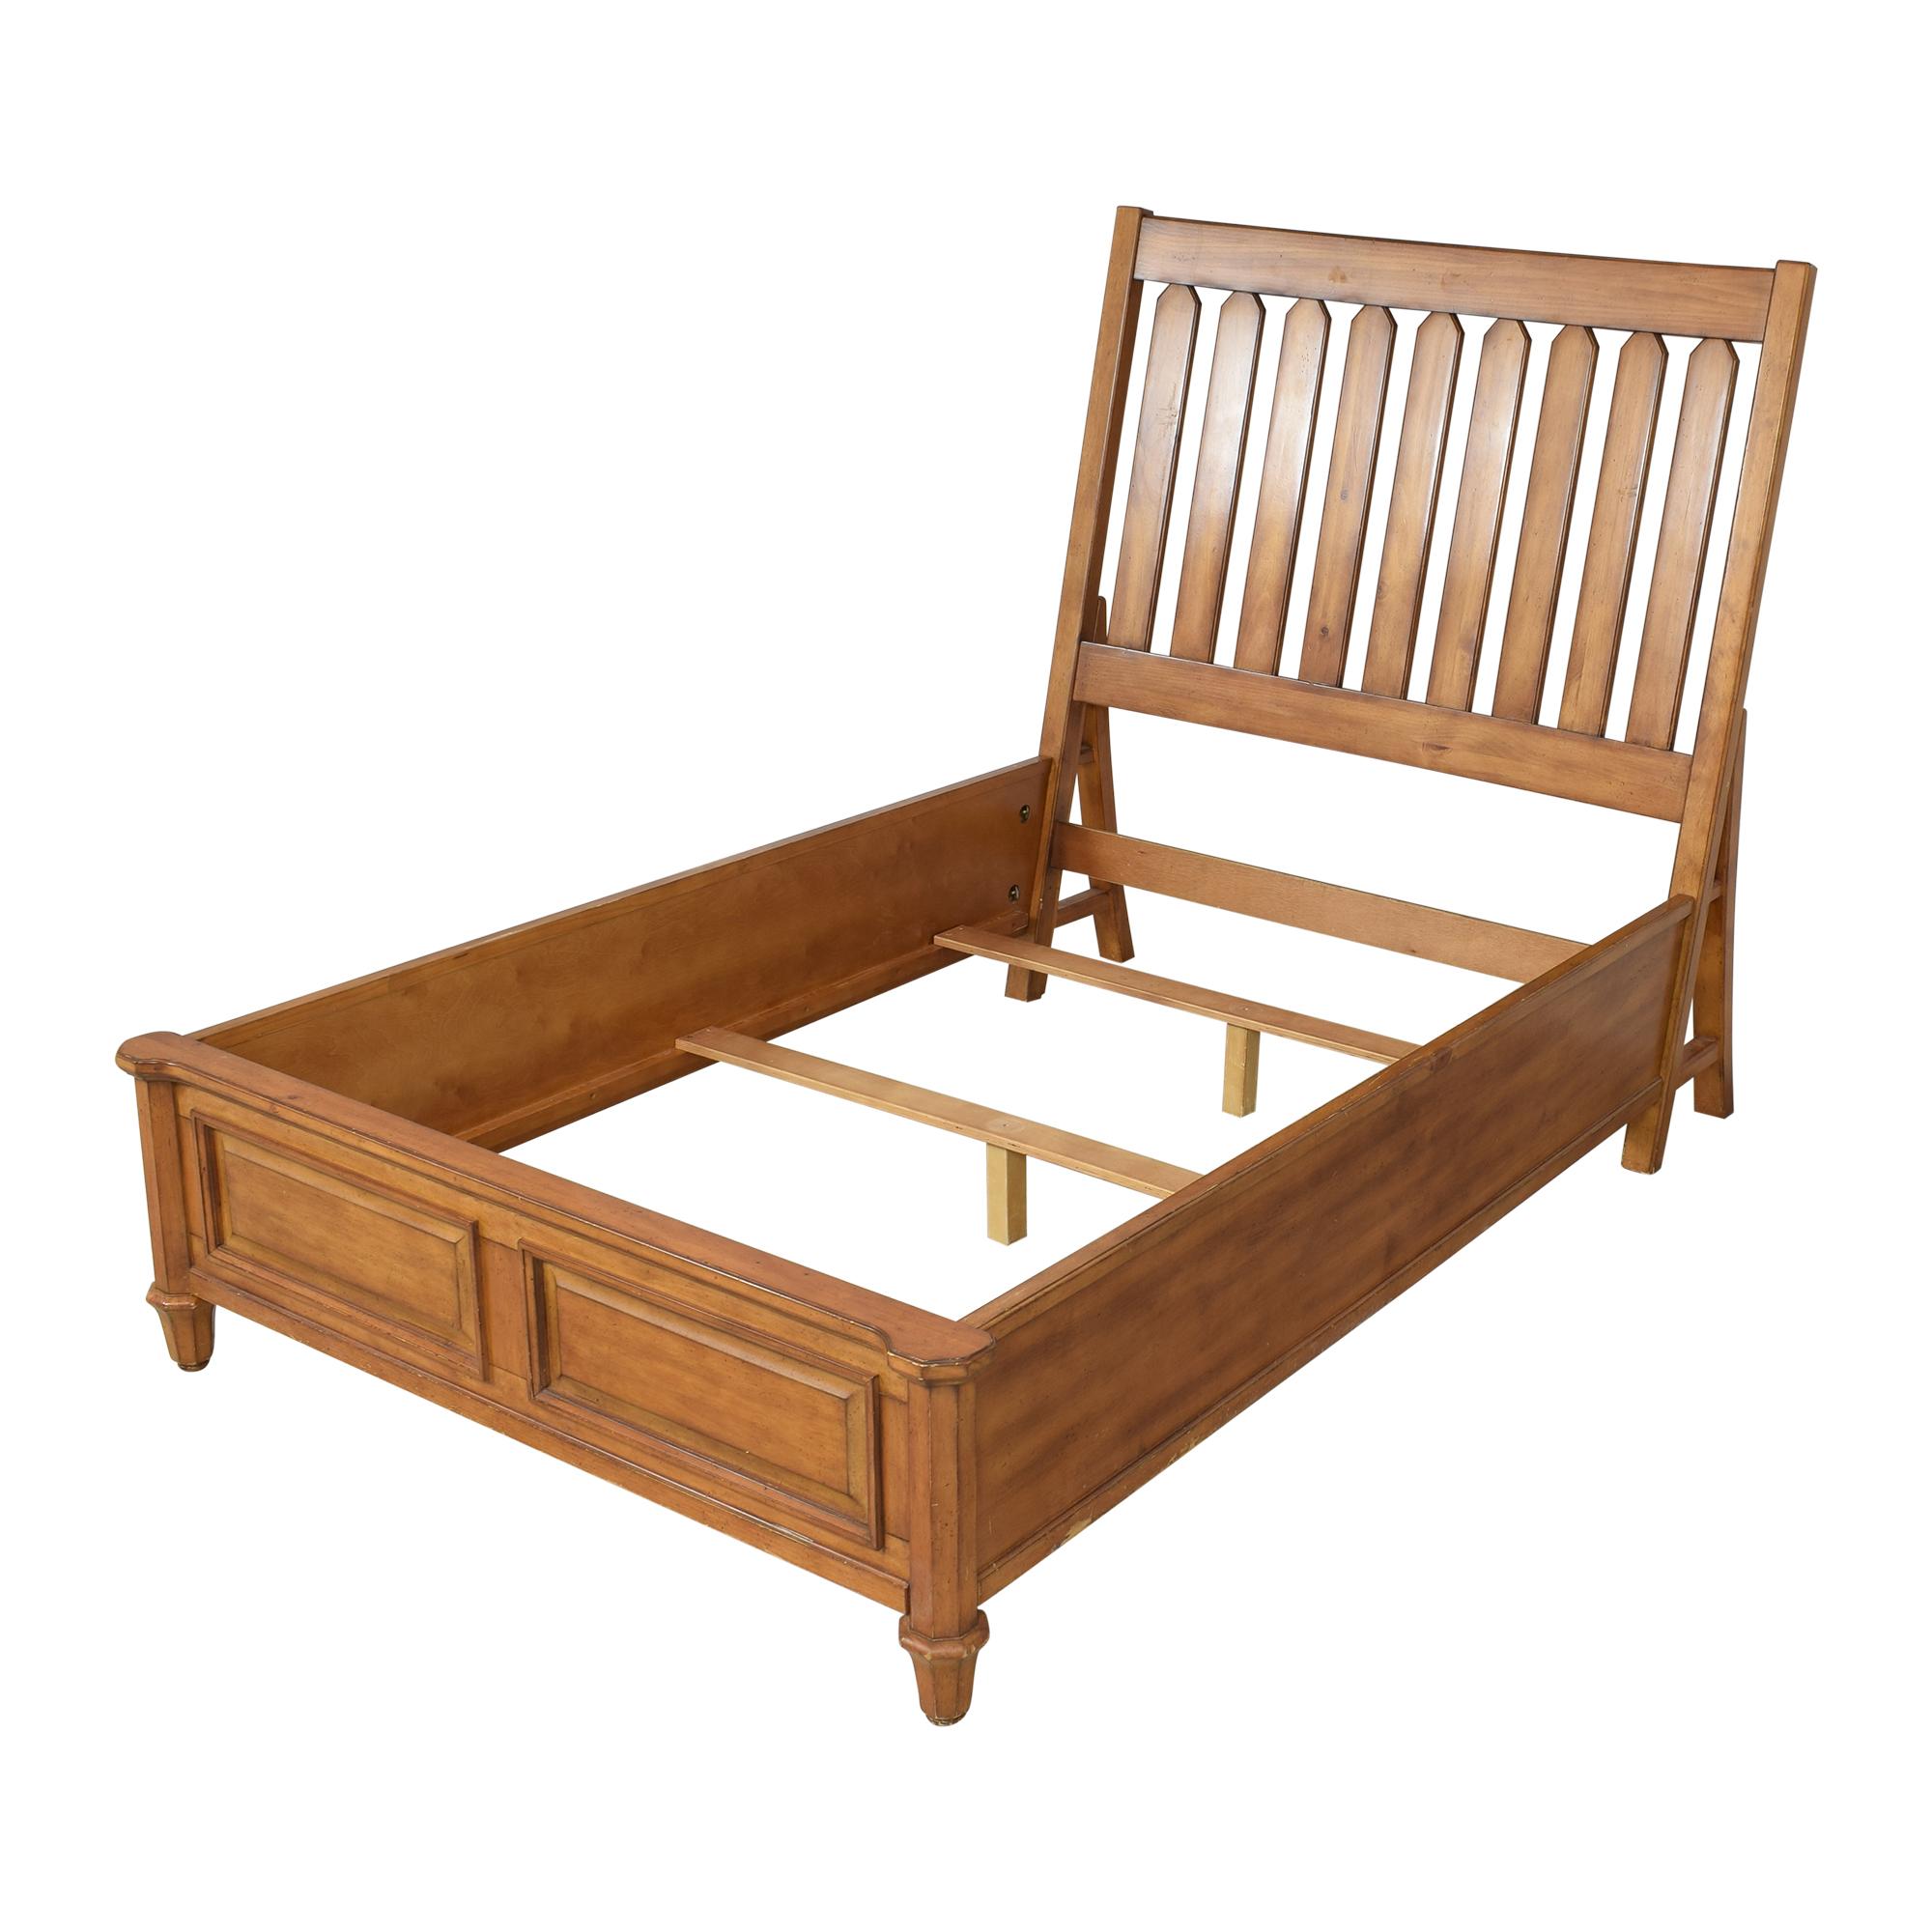 Full Size Platform Bed dimensions